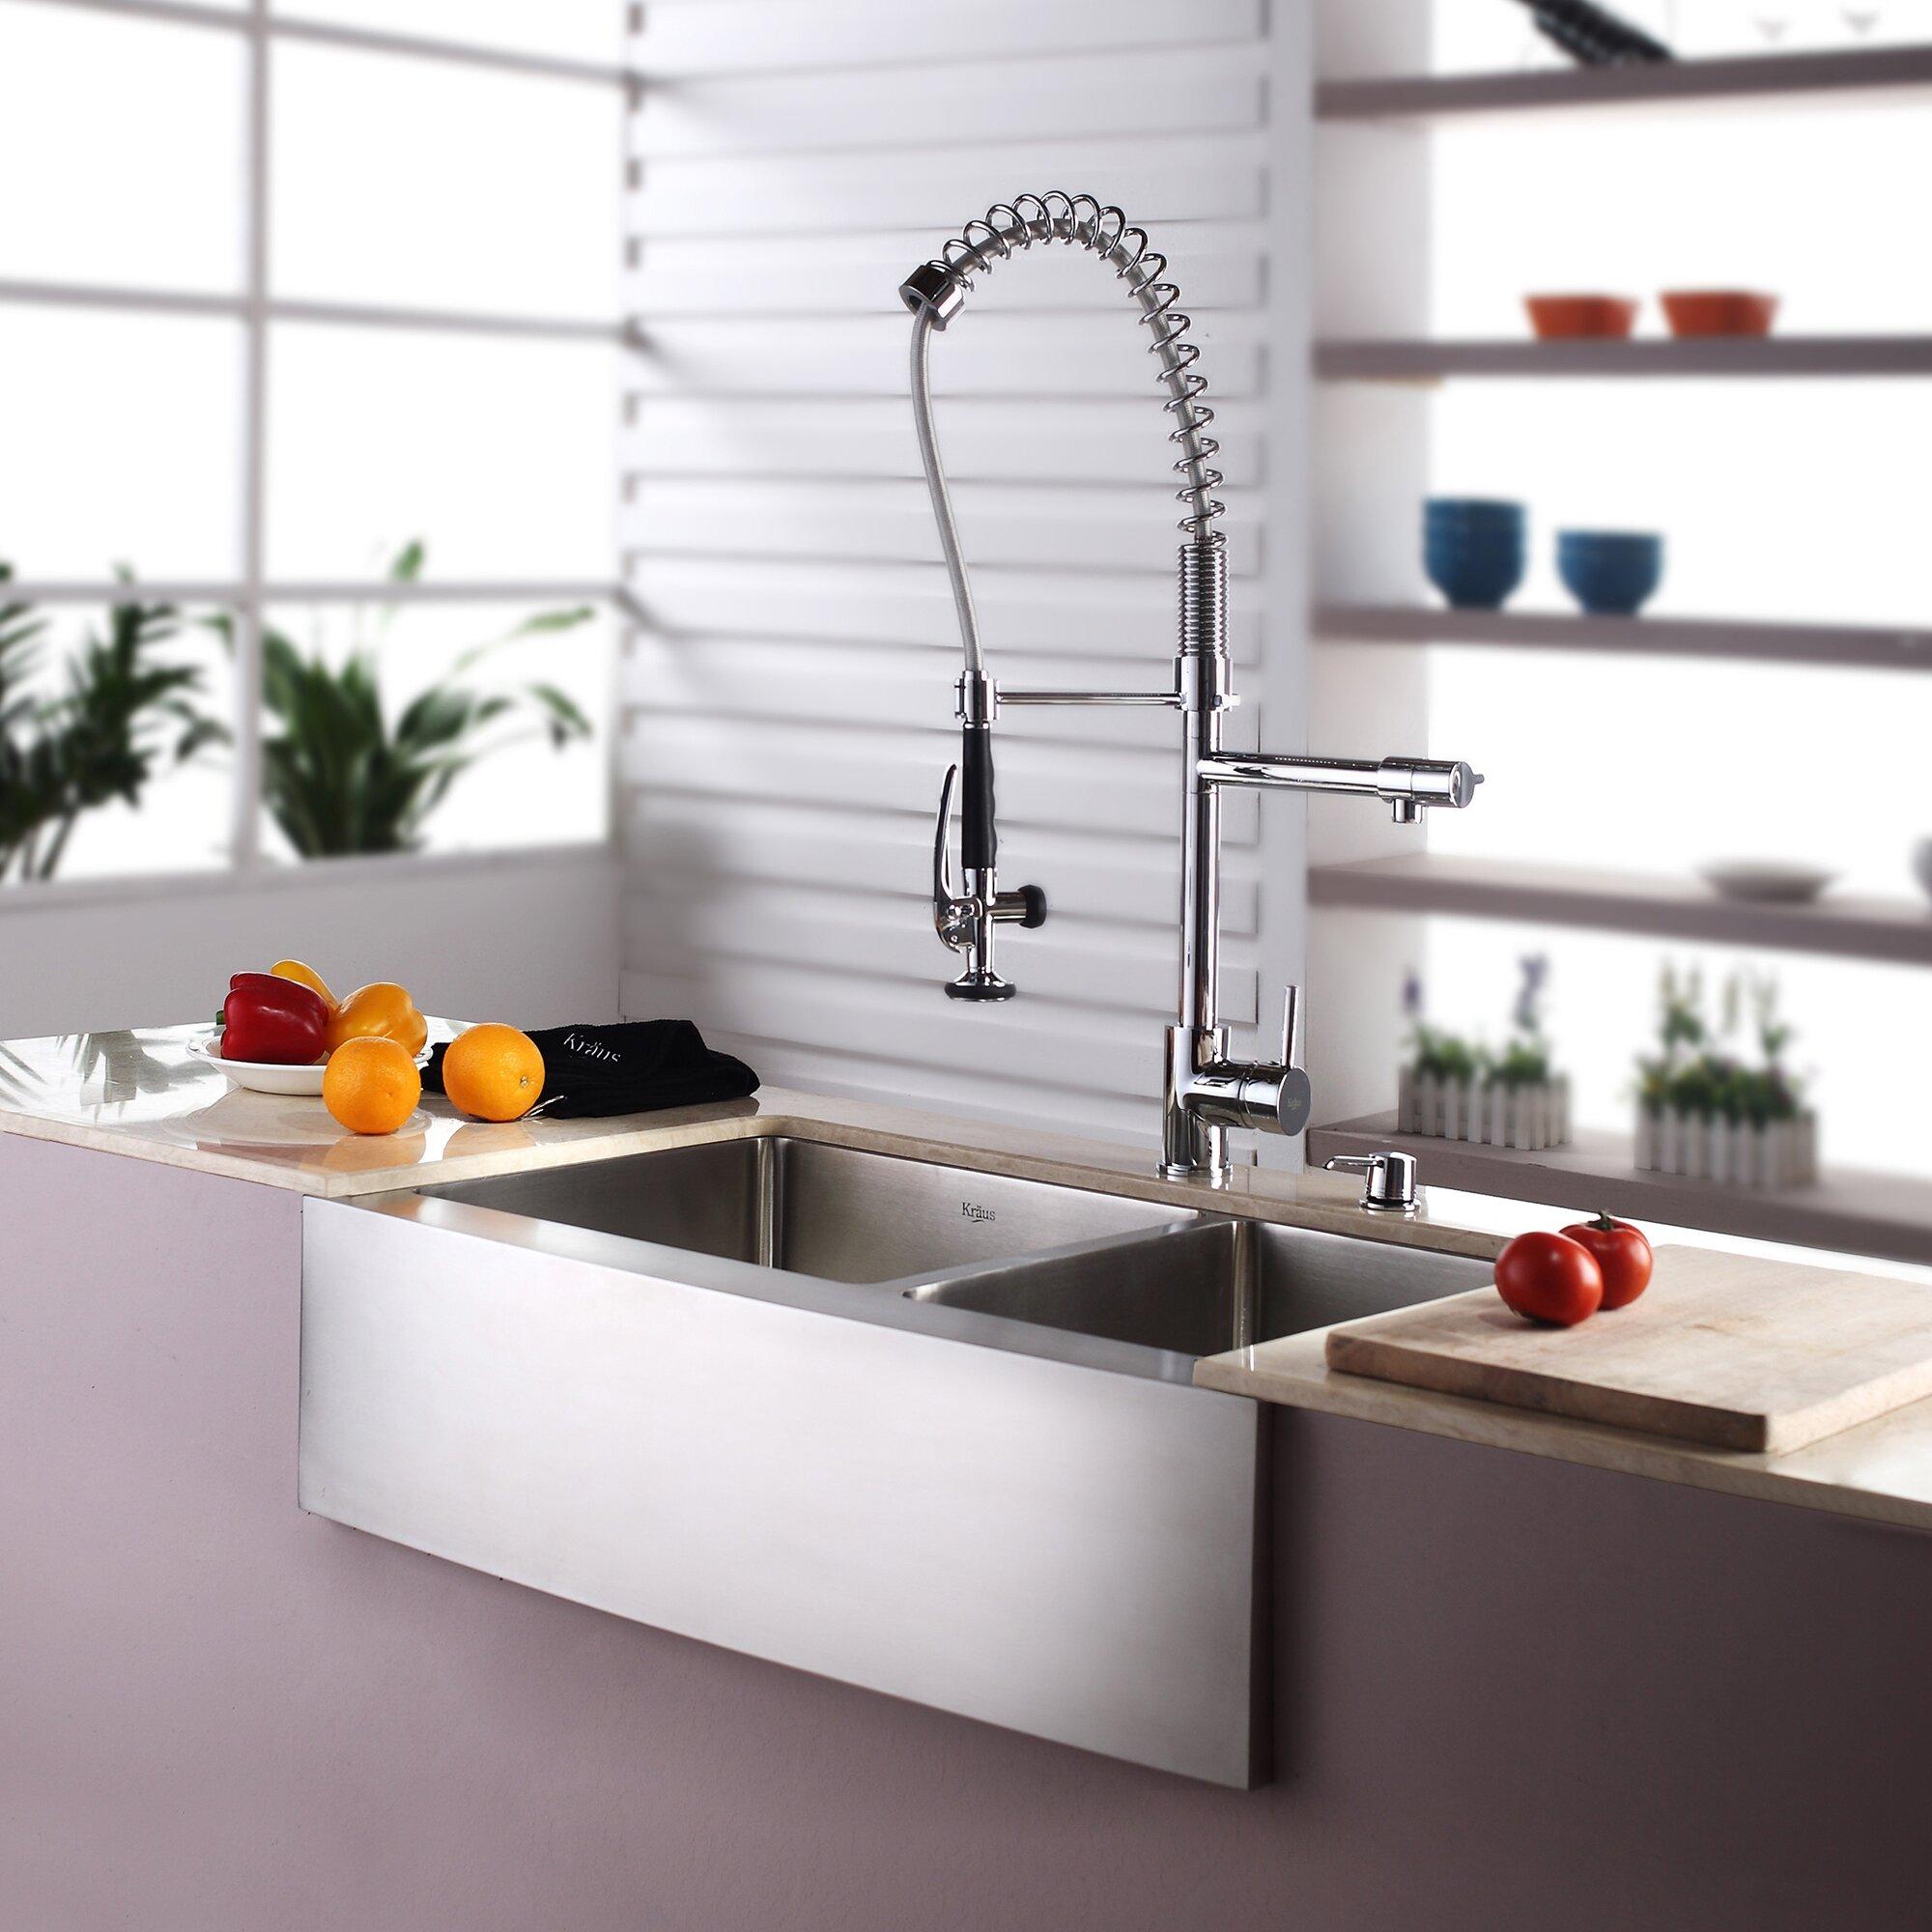 Farmhouse Sink With Two Bowls : Kraus Farmhouse 33